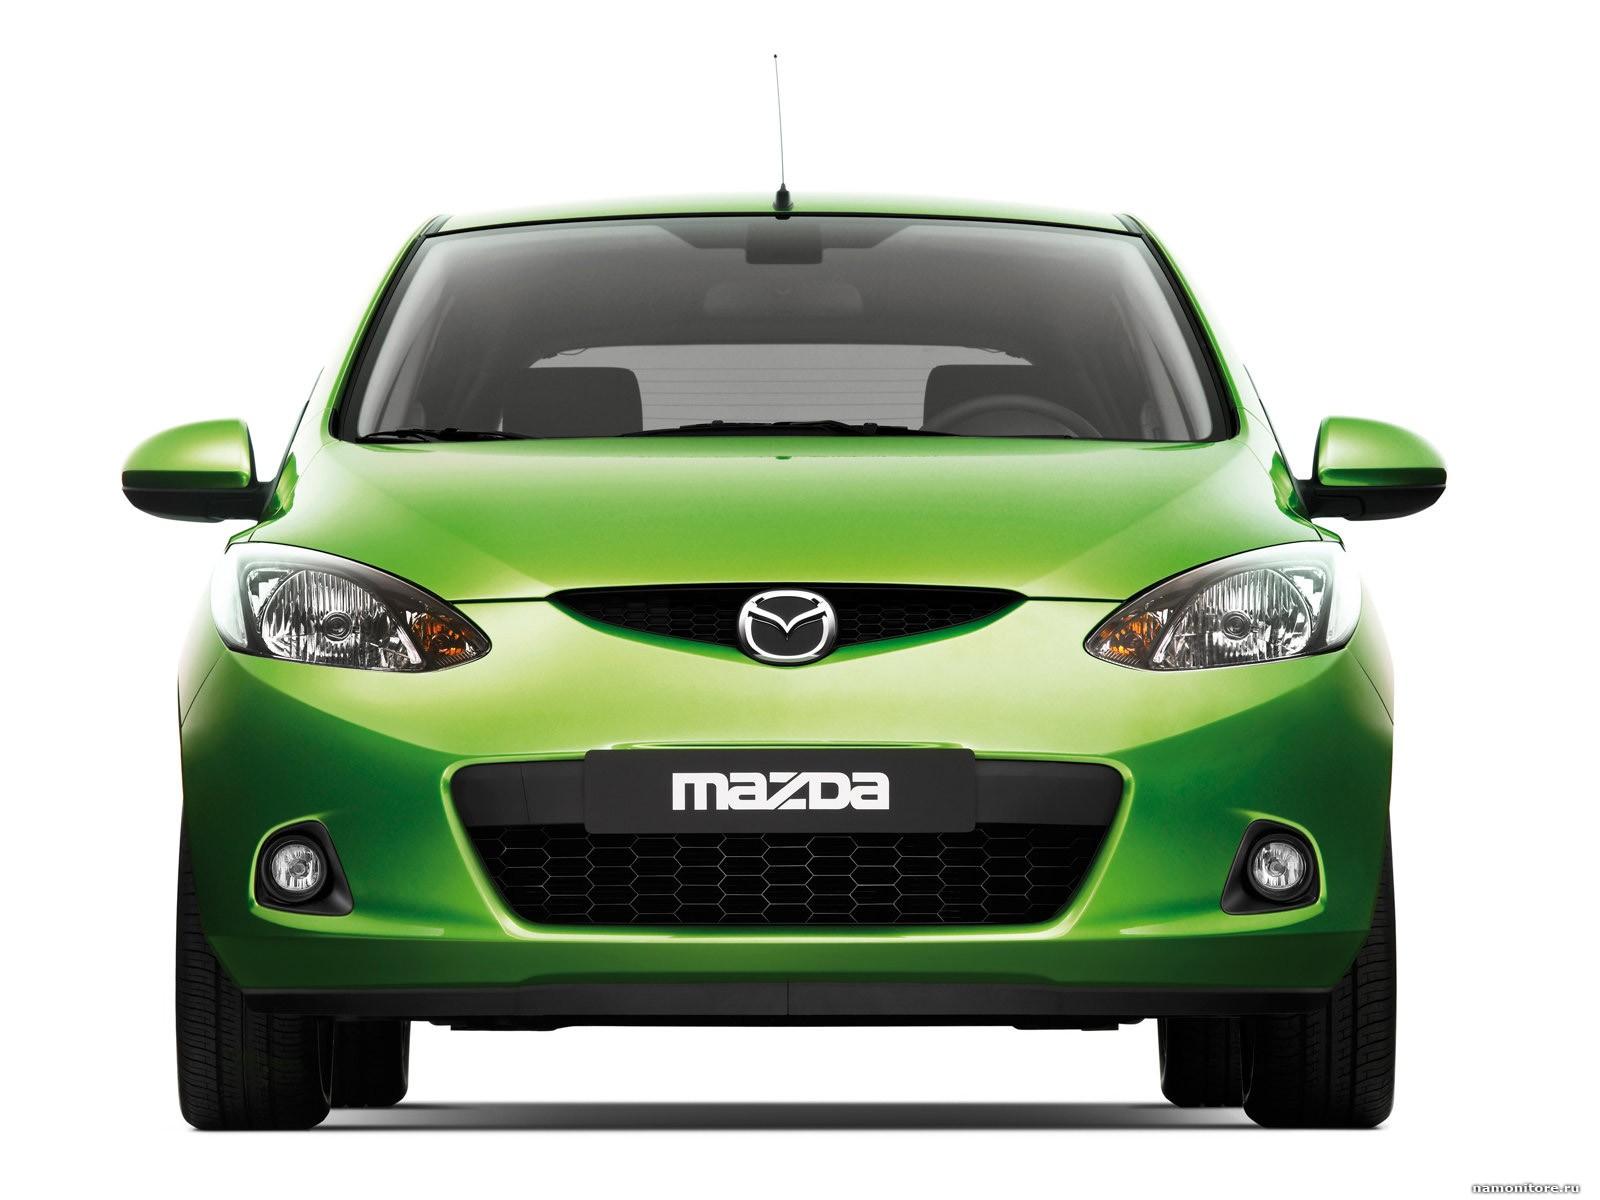 Mazda 2 photo, cars, clipart, green, Mazda, technics.